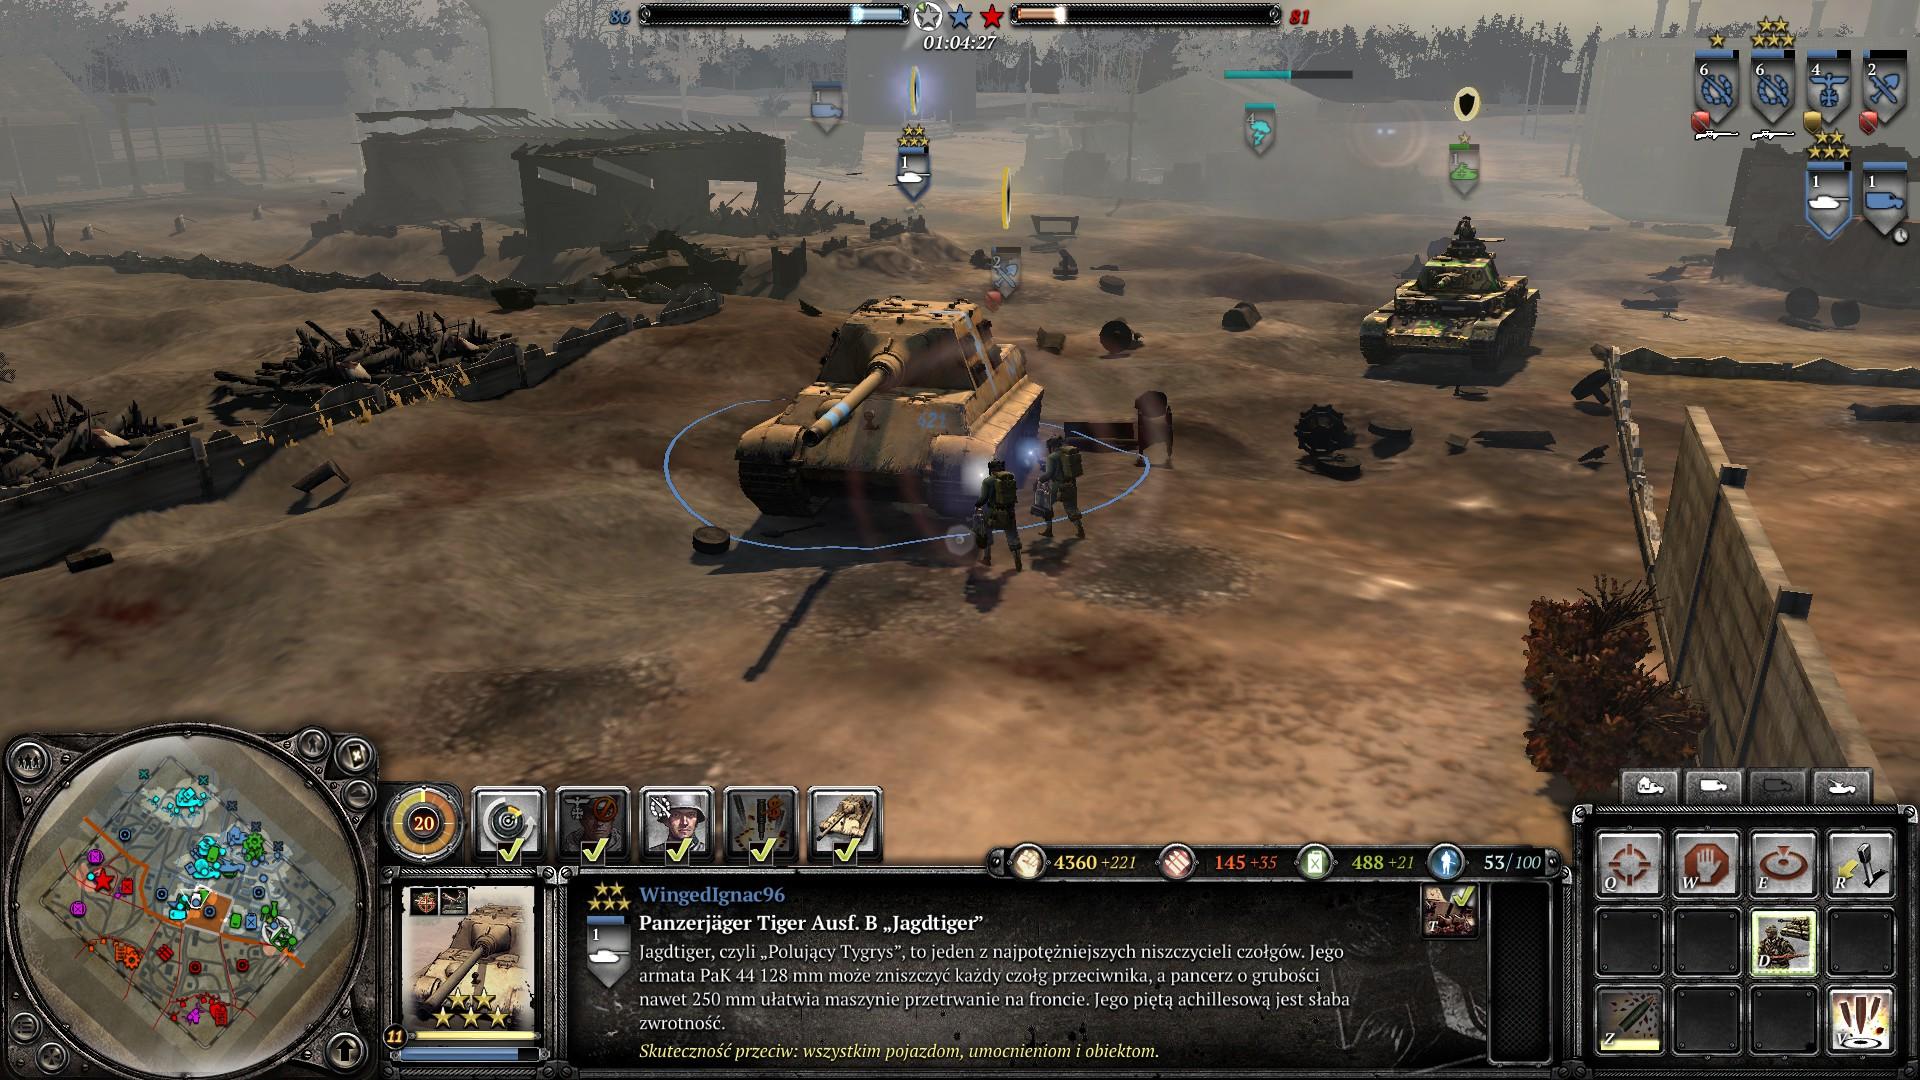 Steam Community Screenshot Jagdtiger Vet 5